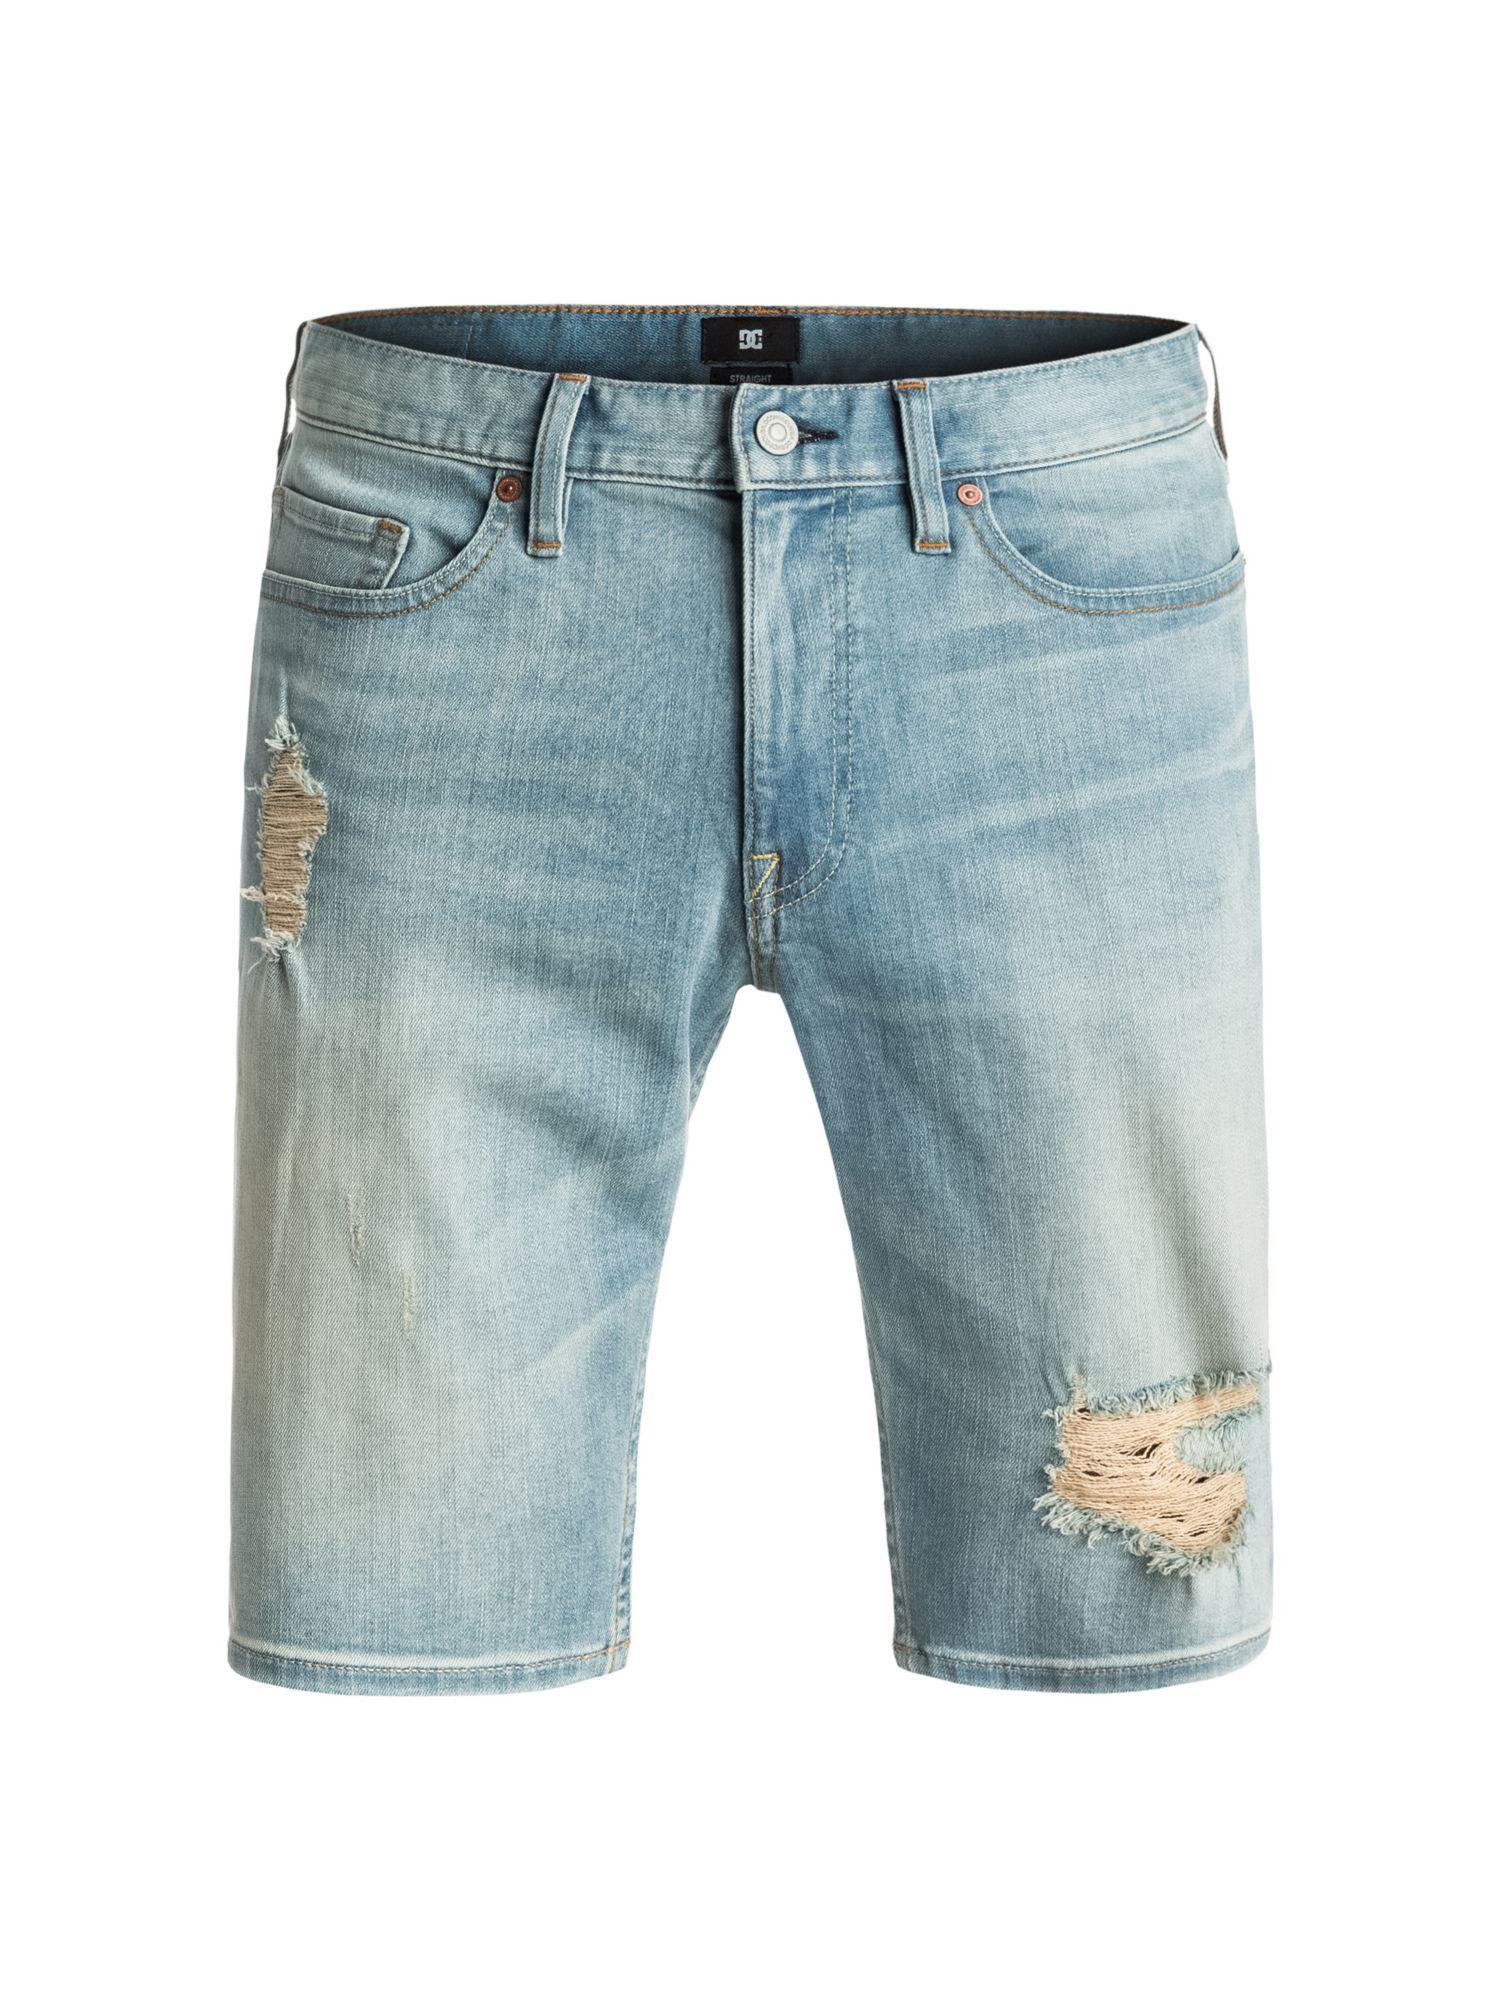 DC SHOES DC Shoes Denim-Shorts »Washed Straight - Denim-Shorts«